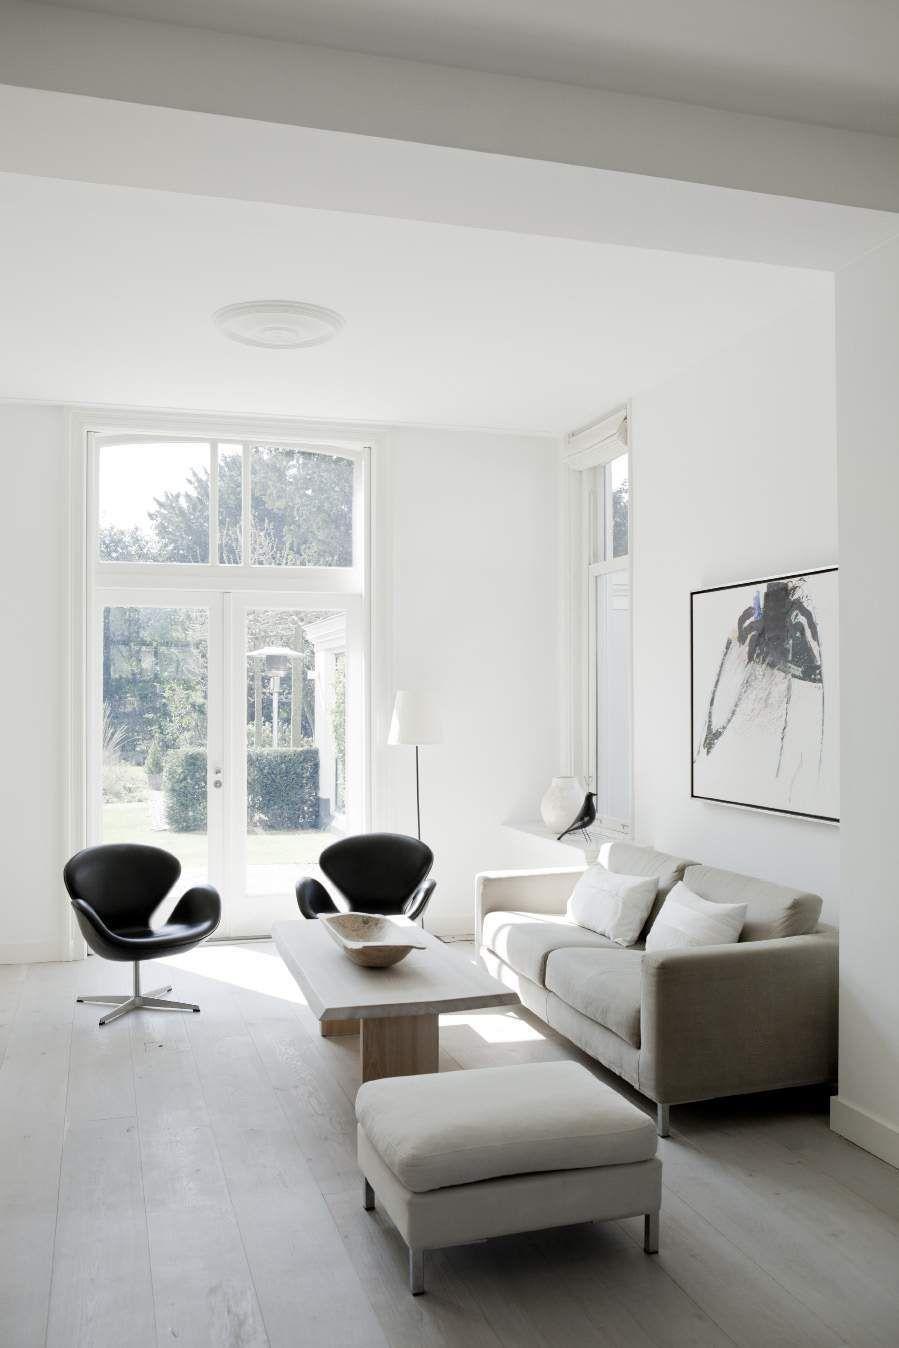 High Quality Swan Chair Replica Arne Jacobsen House Interior Interior Room Interior